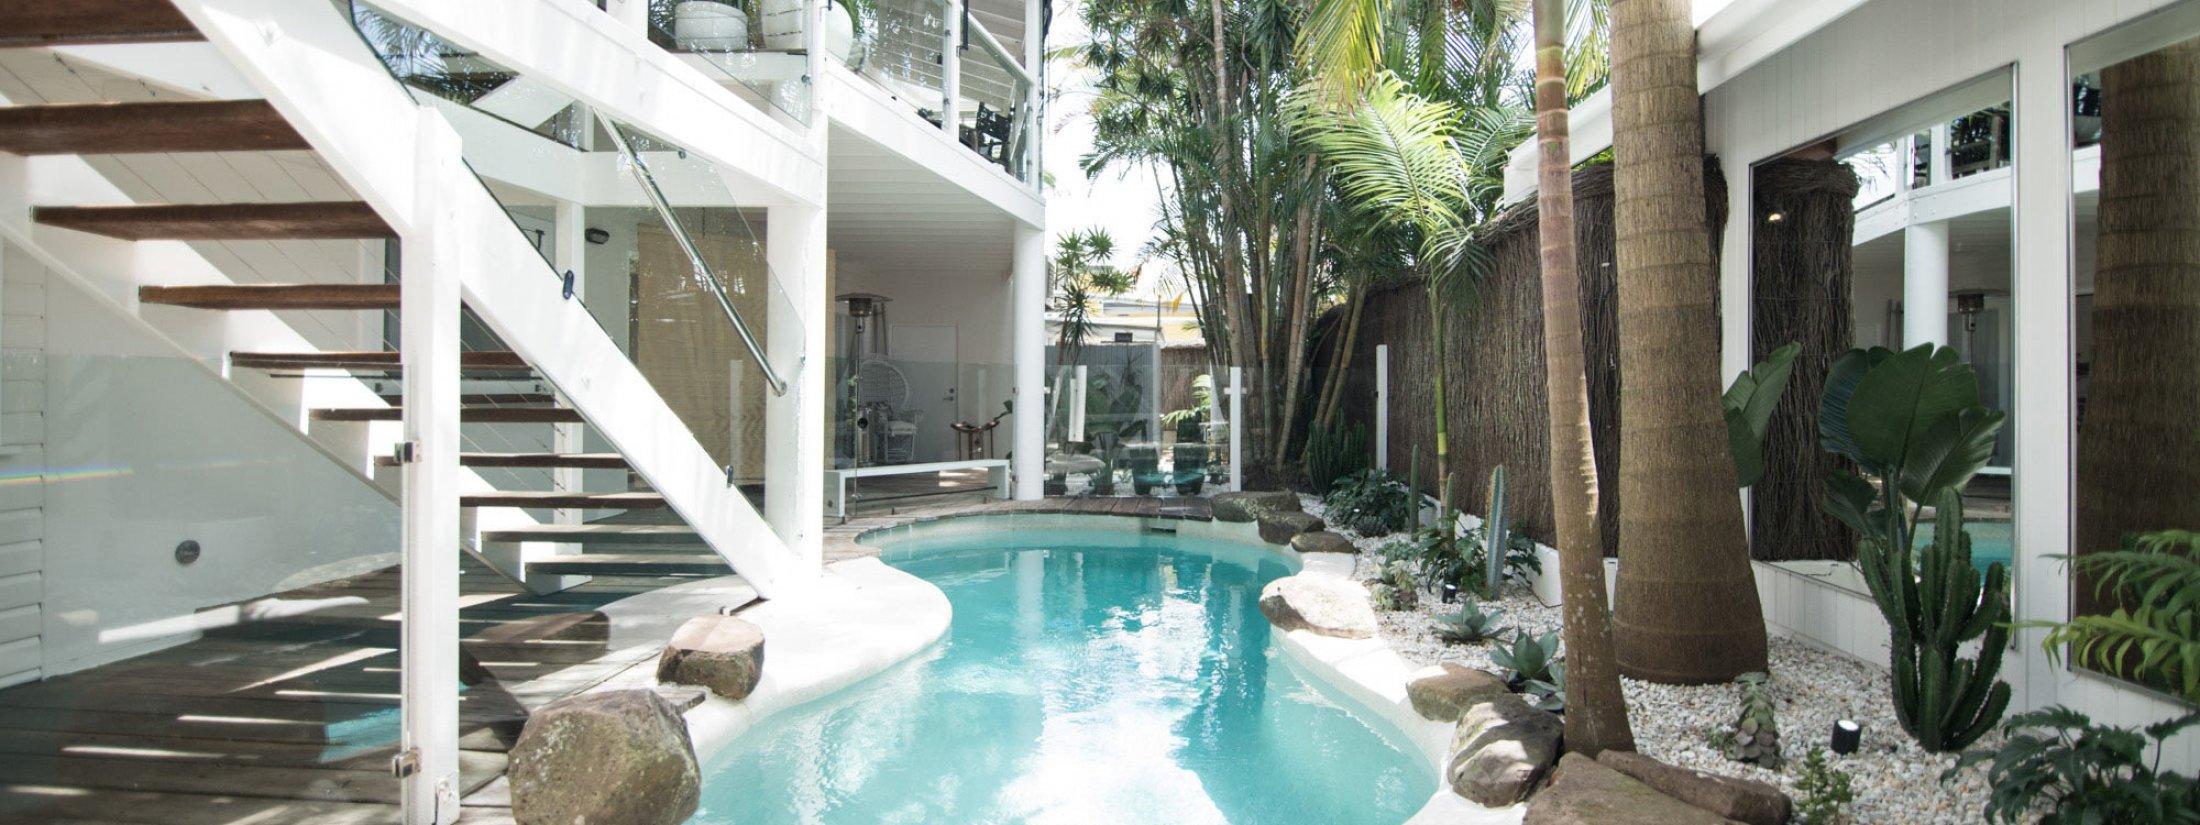 Cactus Rose Villa - Pool Area